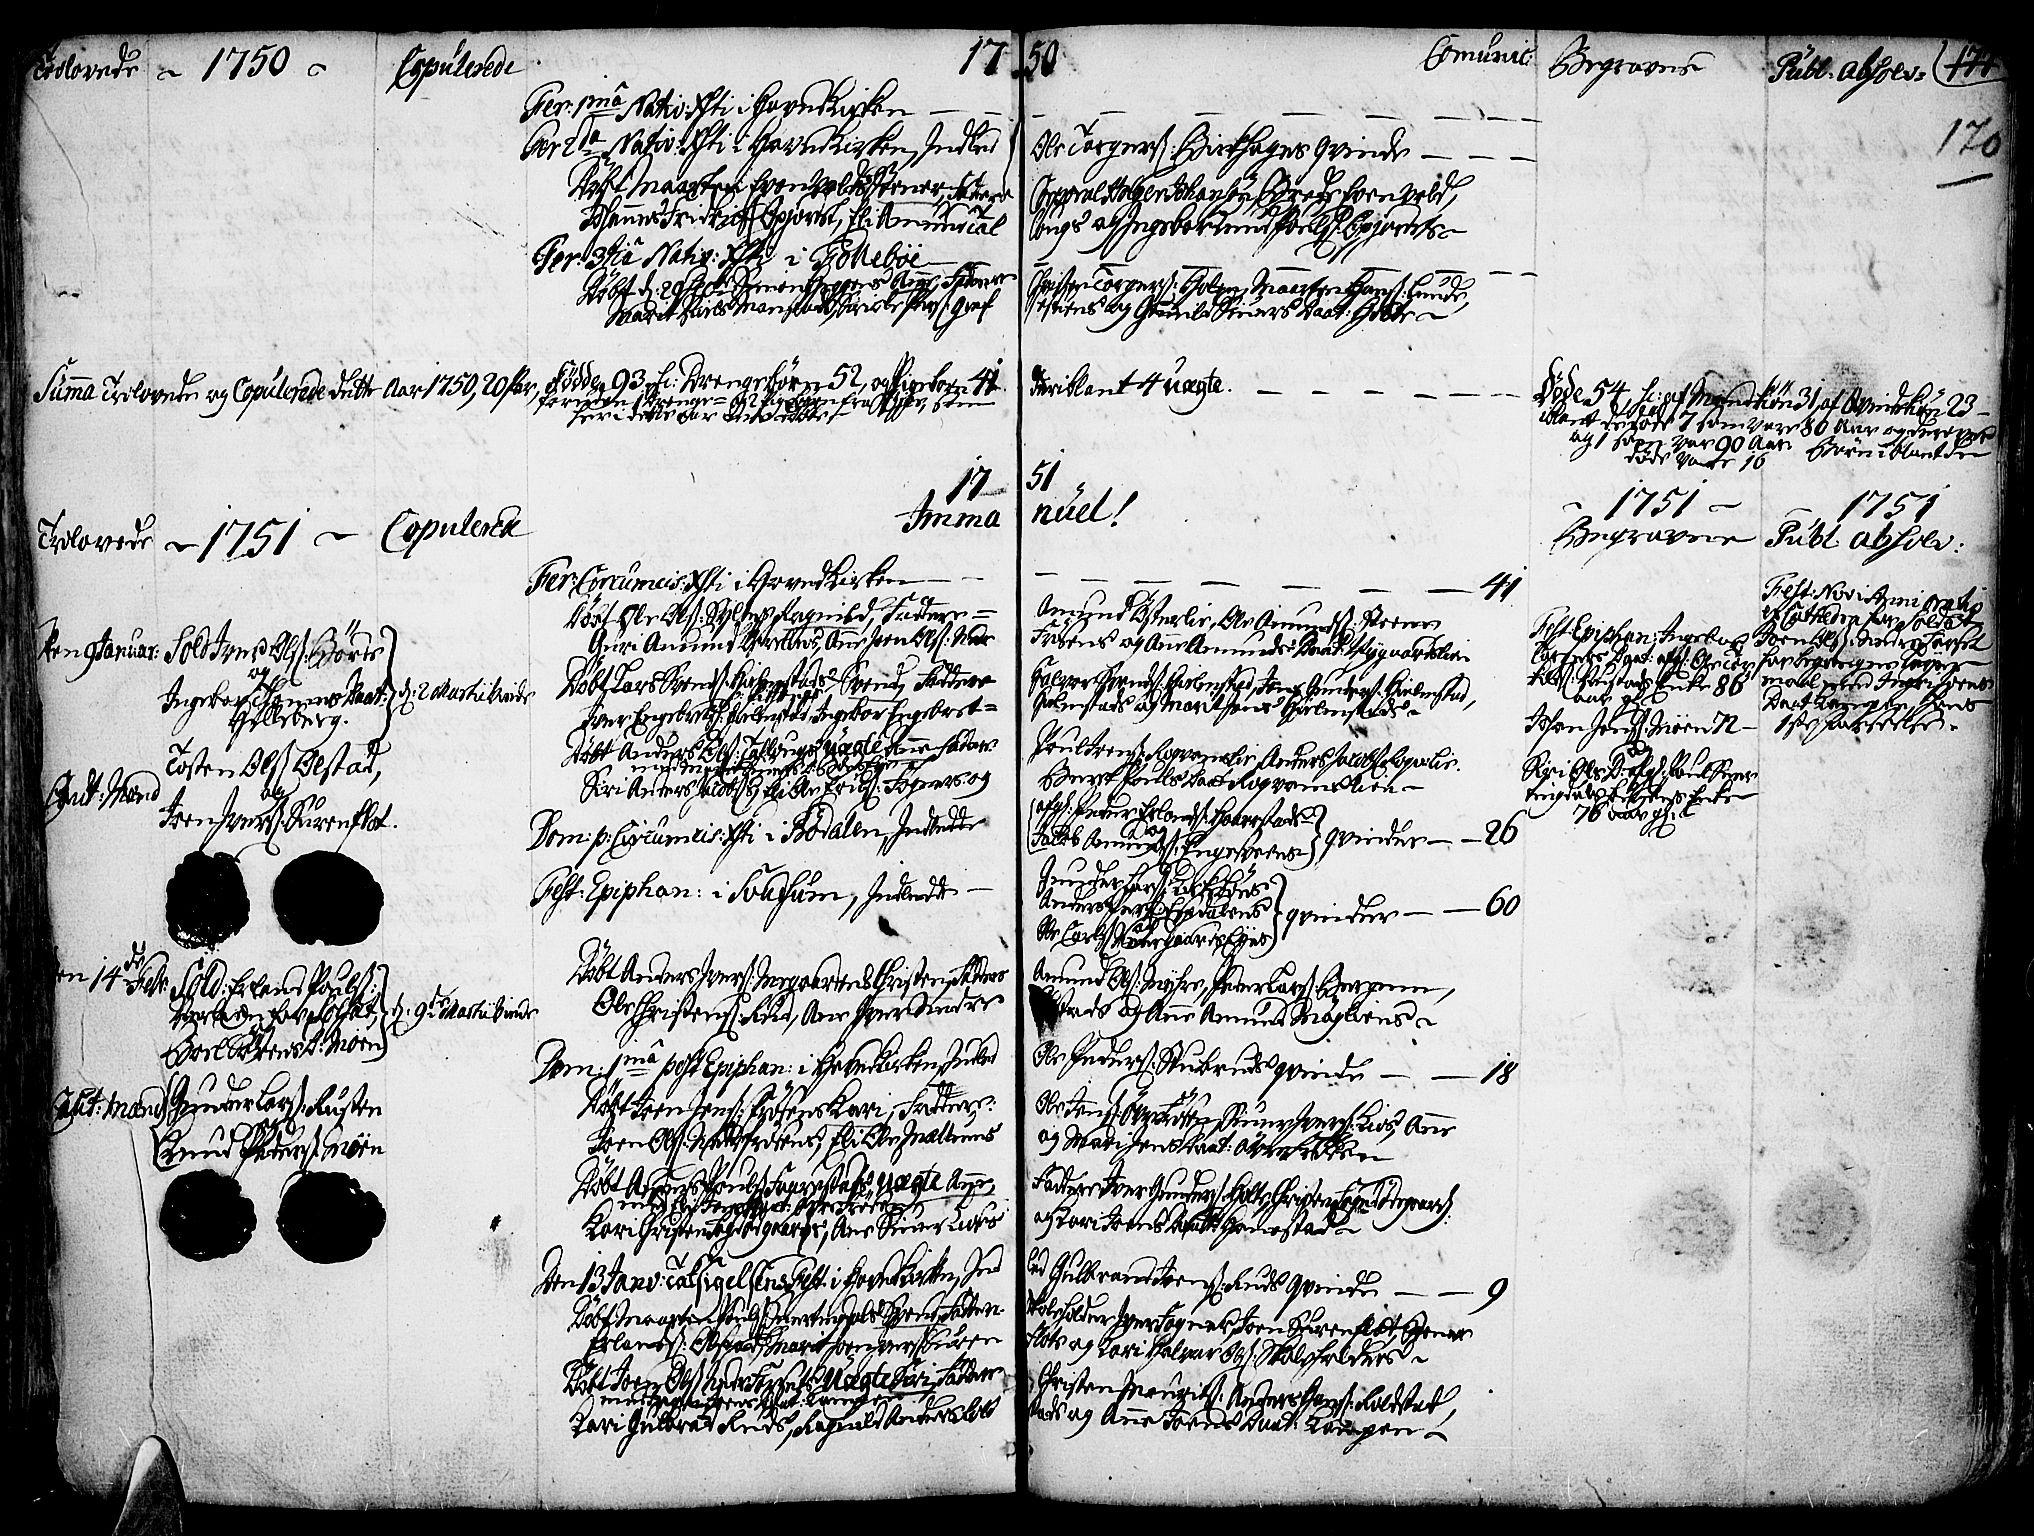 SAH, Gausdal prestekontor, Ministerialbok nr. 2, 1729-1757, s. 170